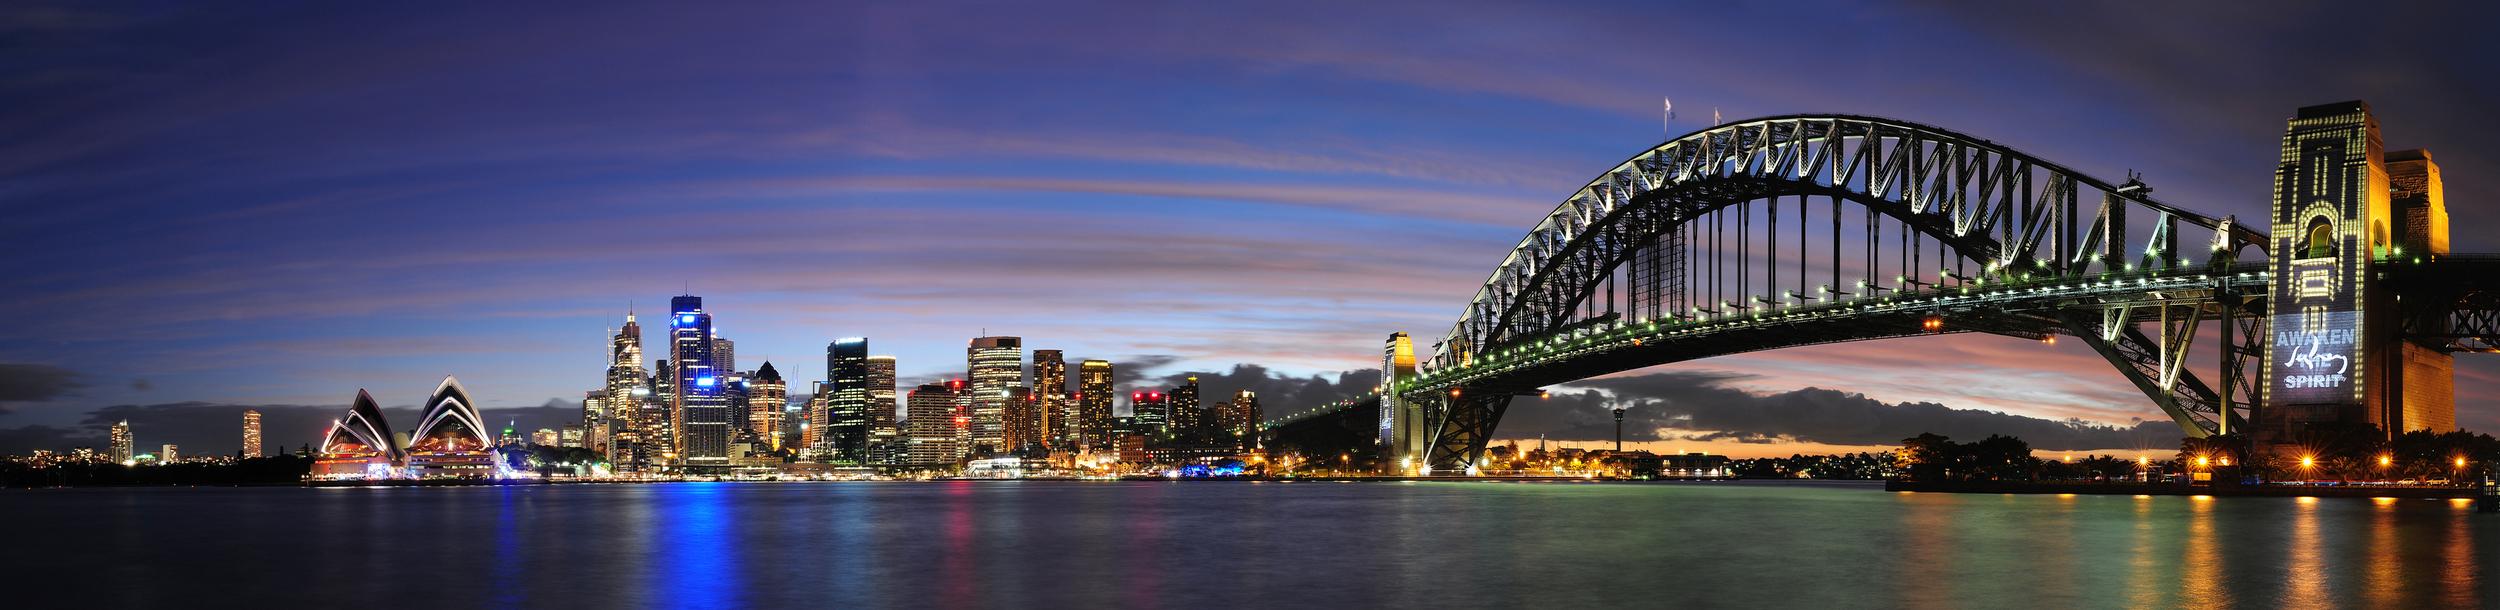 SYDNEY SKYLINE - AUSTRALIEN